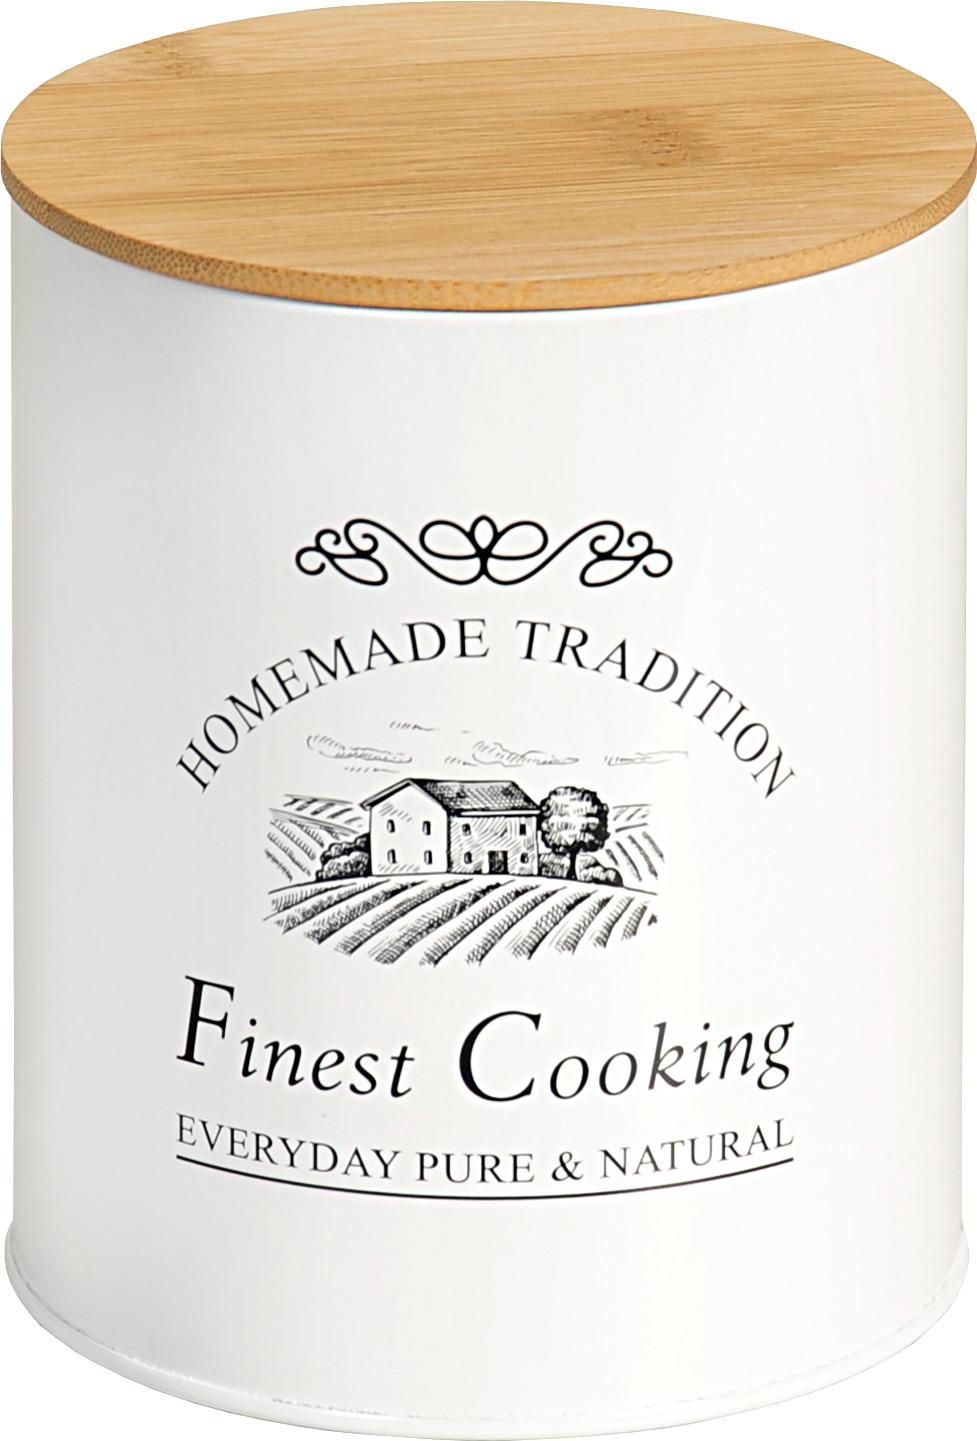 Банка для сыпучих продуктов Kesper Finest Cooking, 3824-9, белый, 11 х 11 х 13,5 см